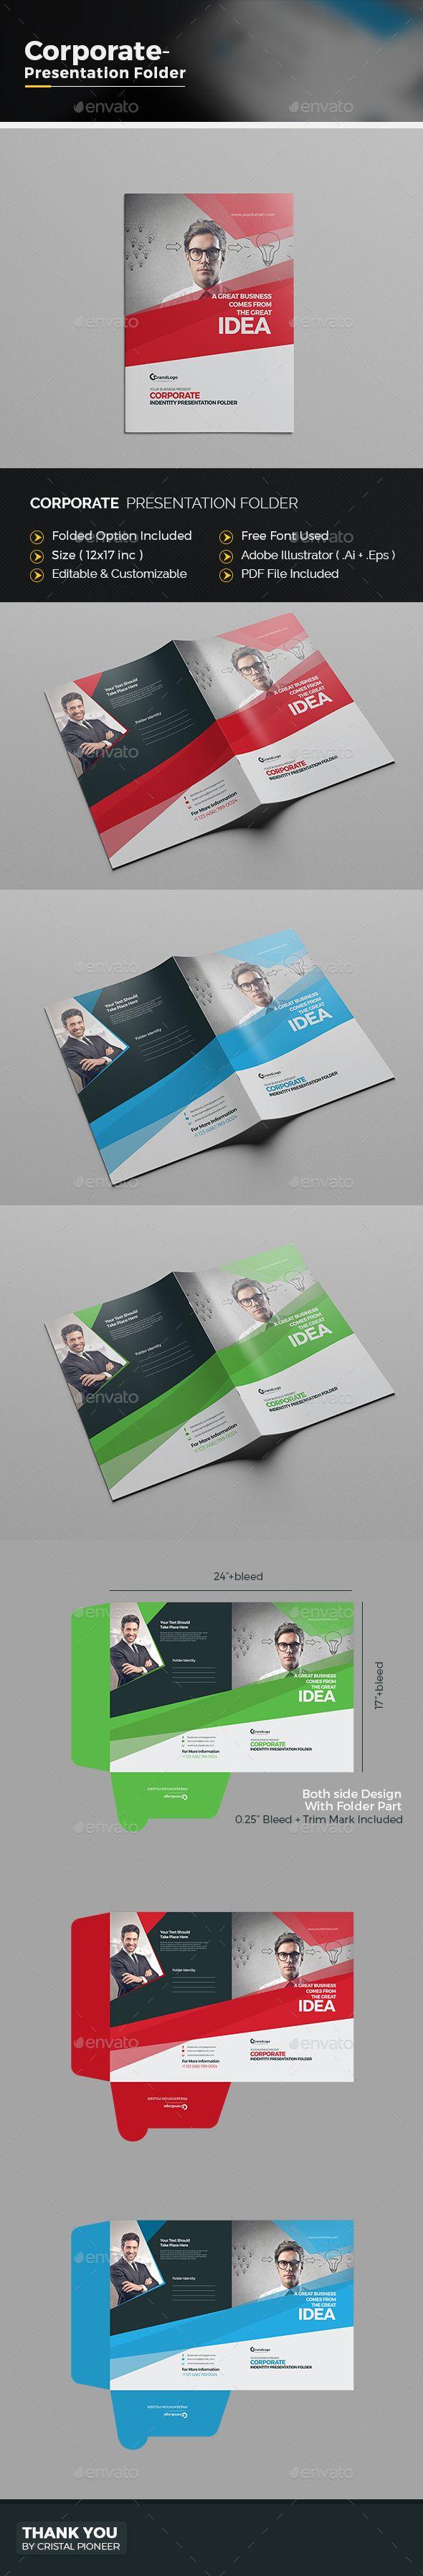 14 best presentation folders images on pinterest | presentation, Presentation templates